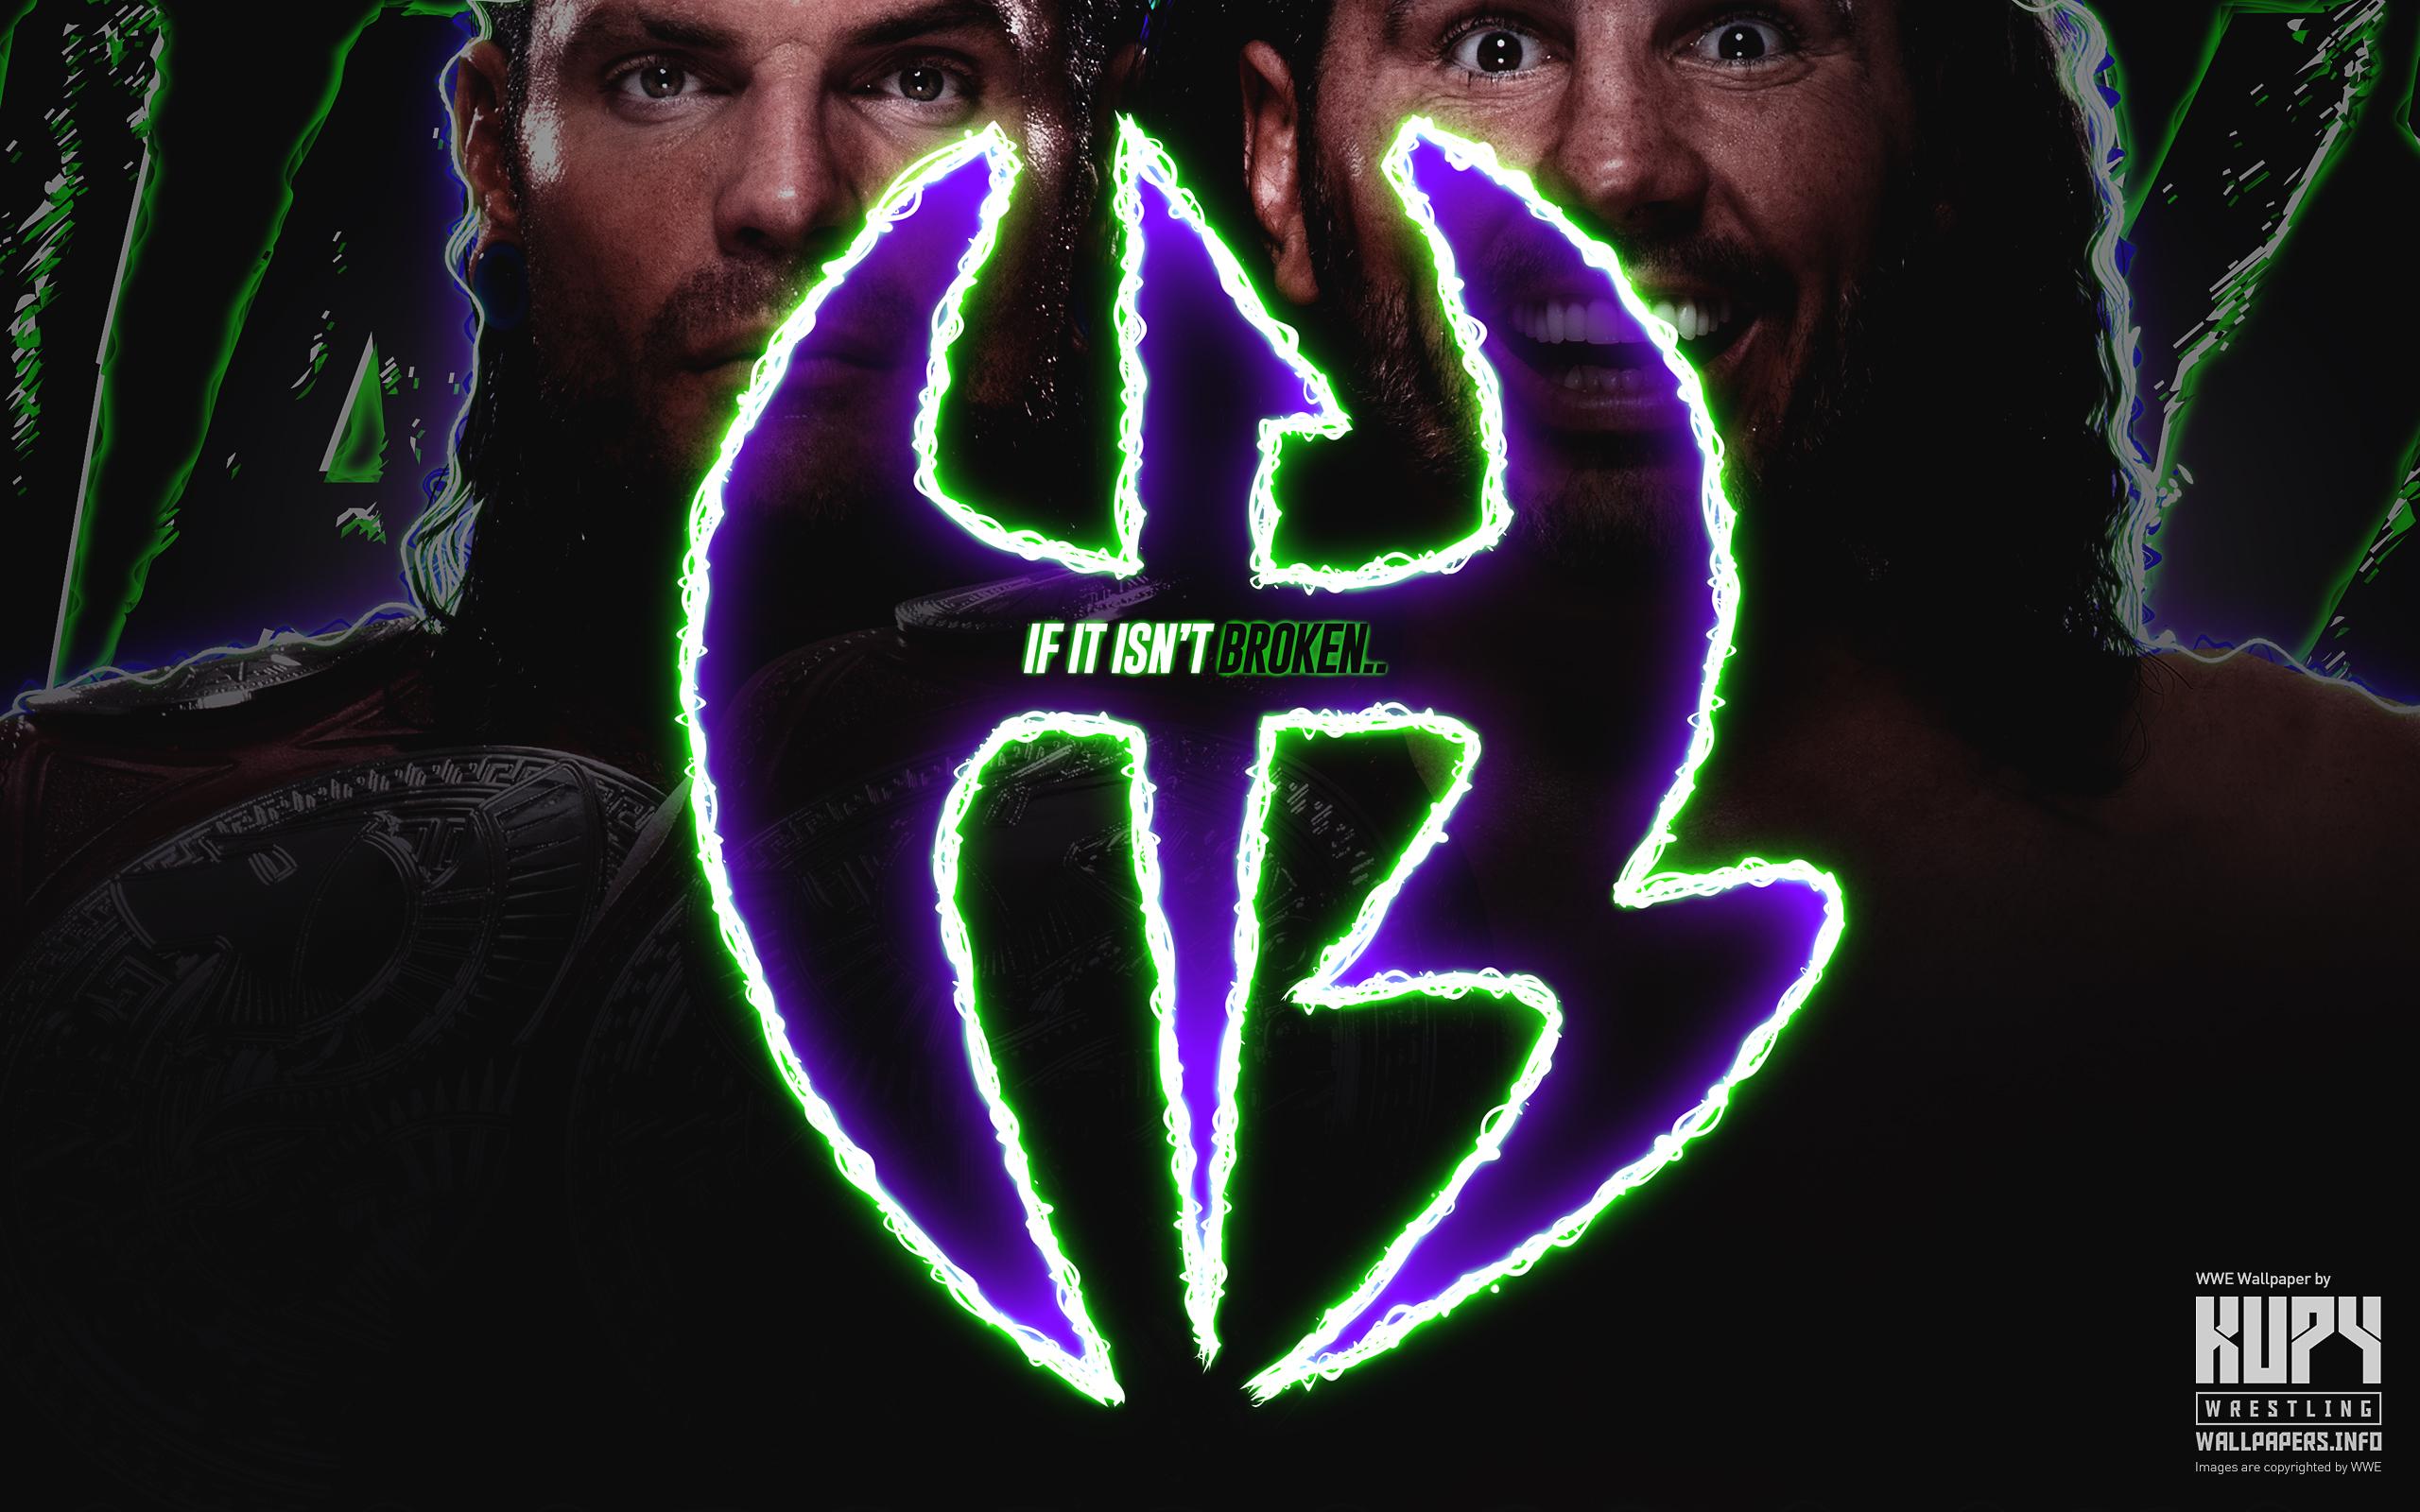 New 2017 Hardy Boyz Wallpaper Kupy Wrestling Wallpapers The